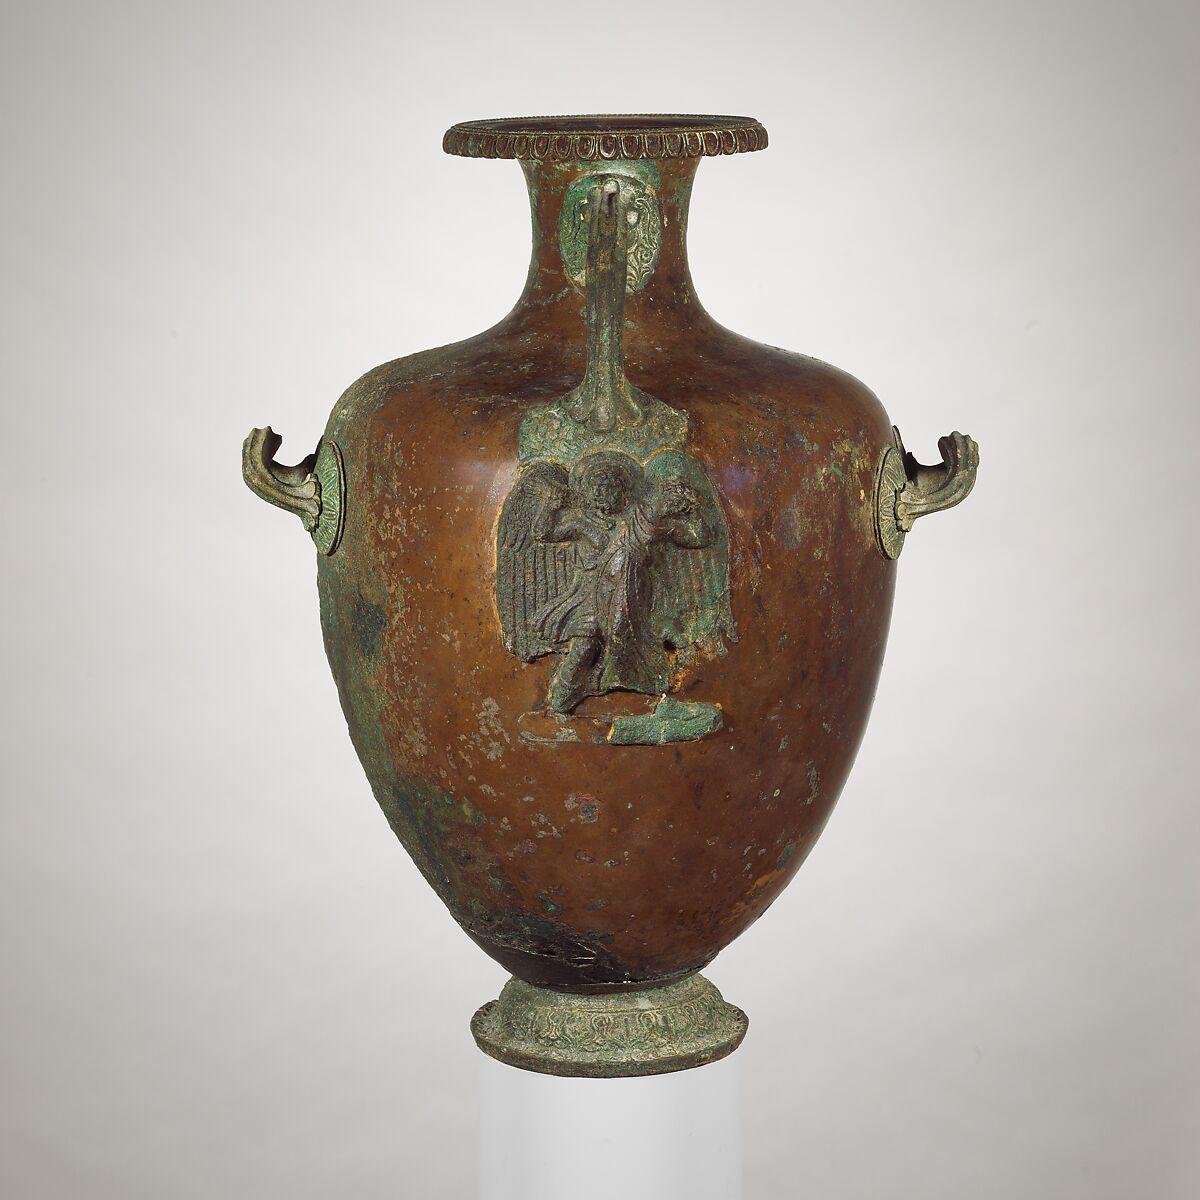 Bronze hydria (water jar) | Greek | Late Classical | The Met